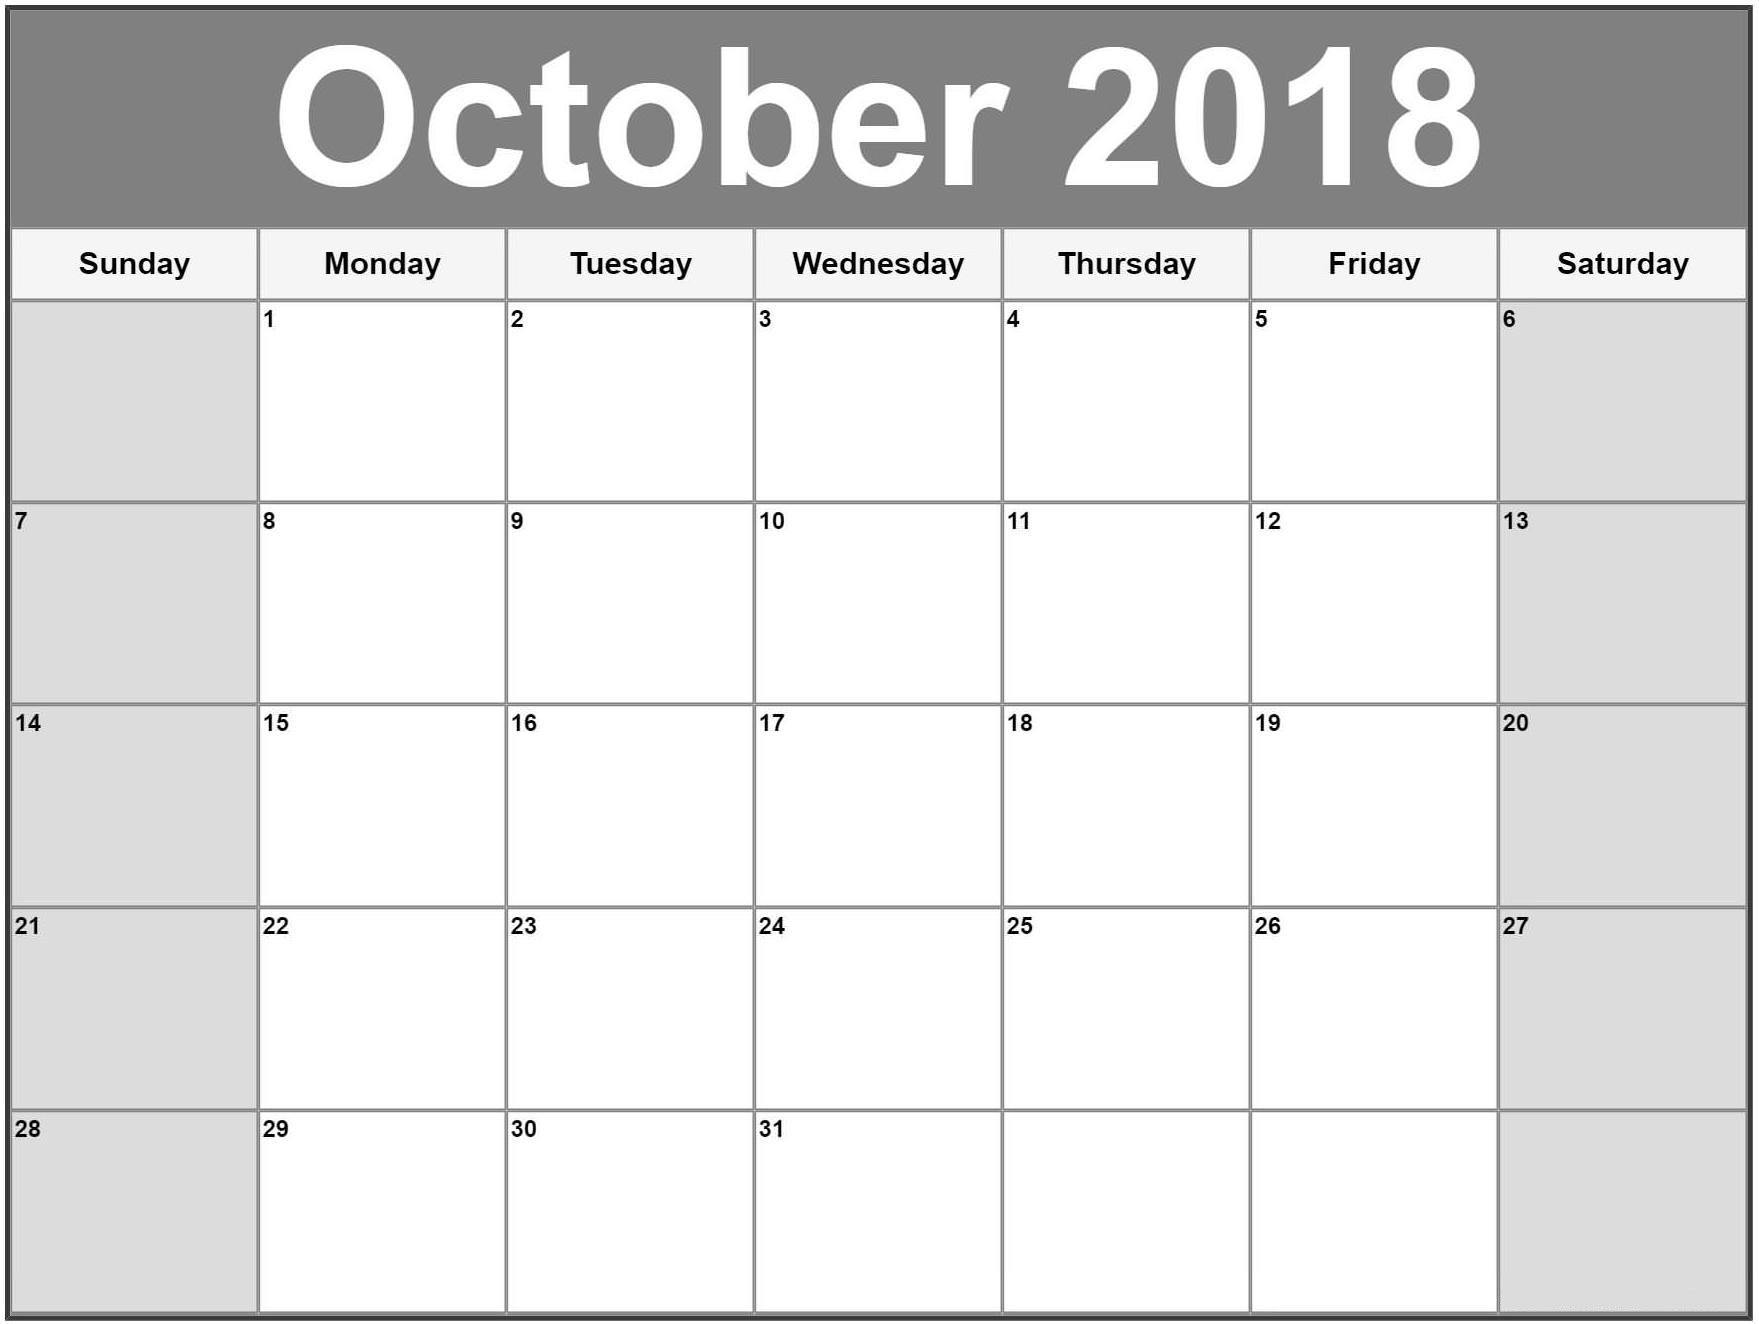 download october 2018 pdf excel word template september 2018 Calendar October 2018 Template erdferdf